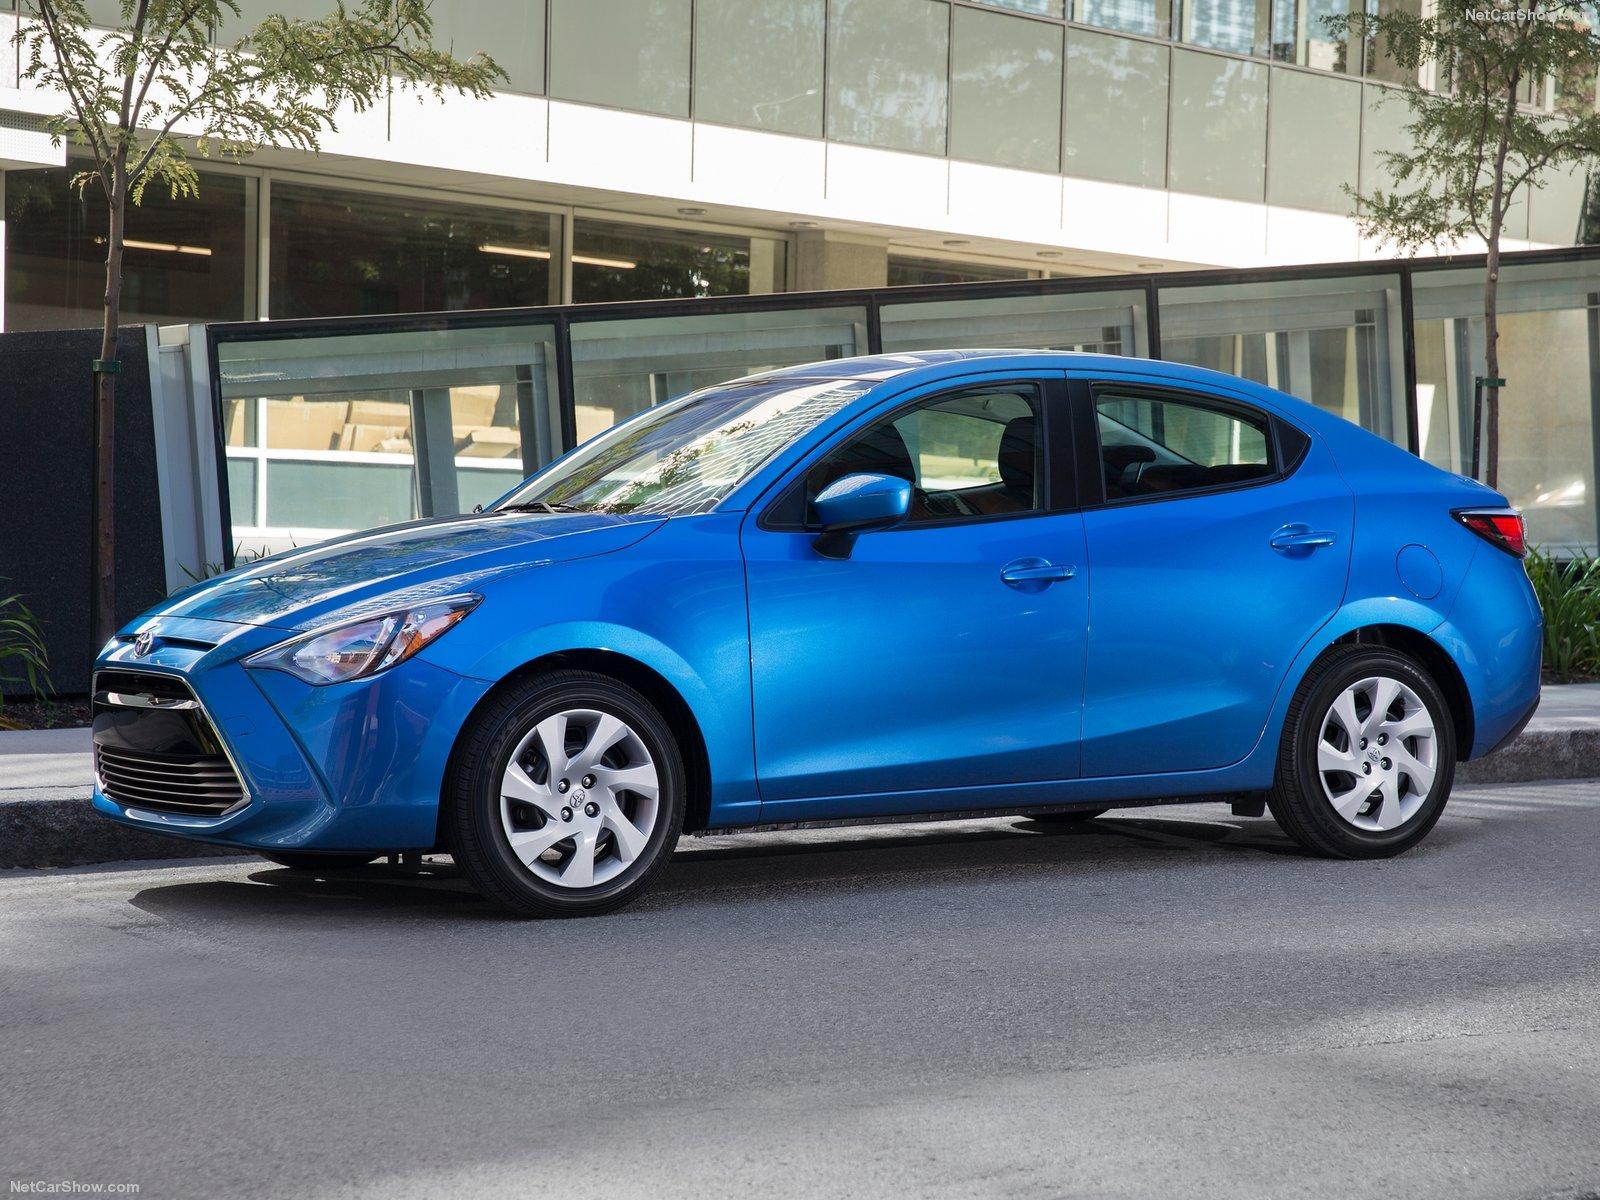 Đánh giá Toyota Yaris Sedan 2016 & giá xe